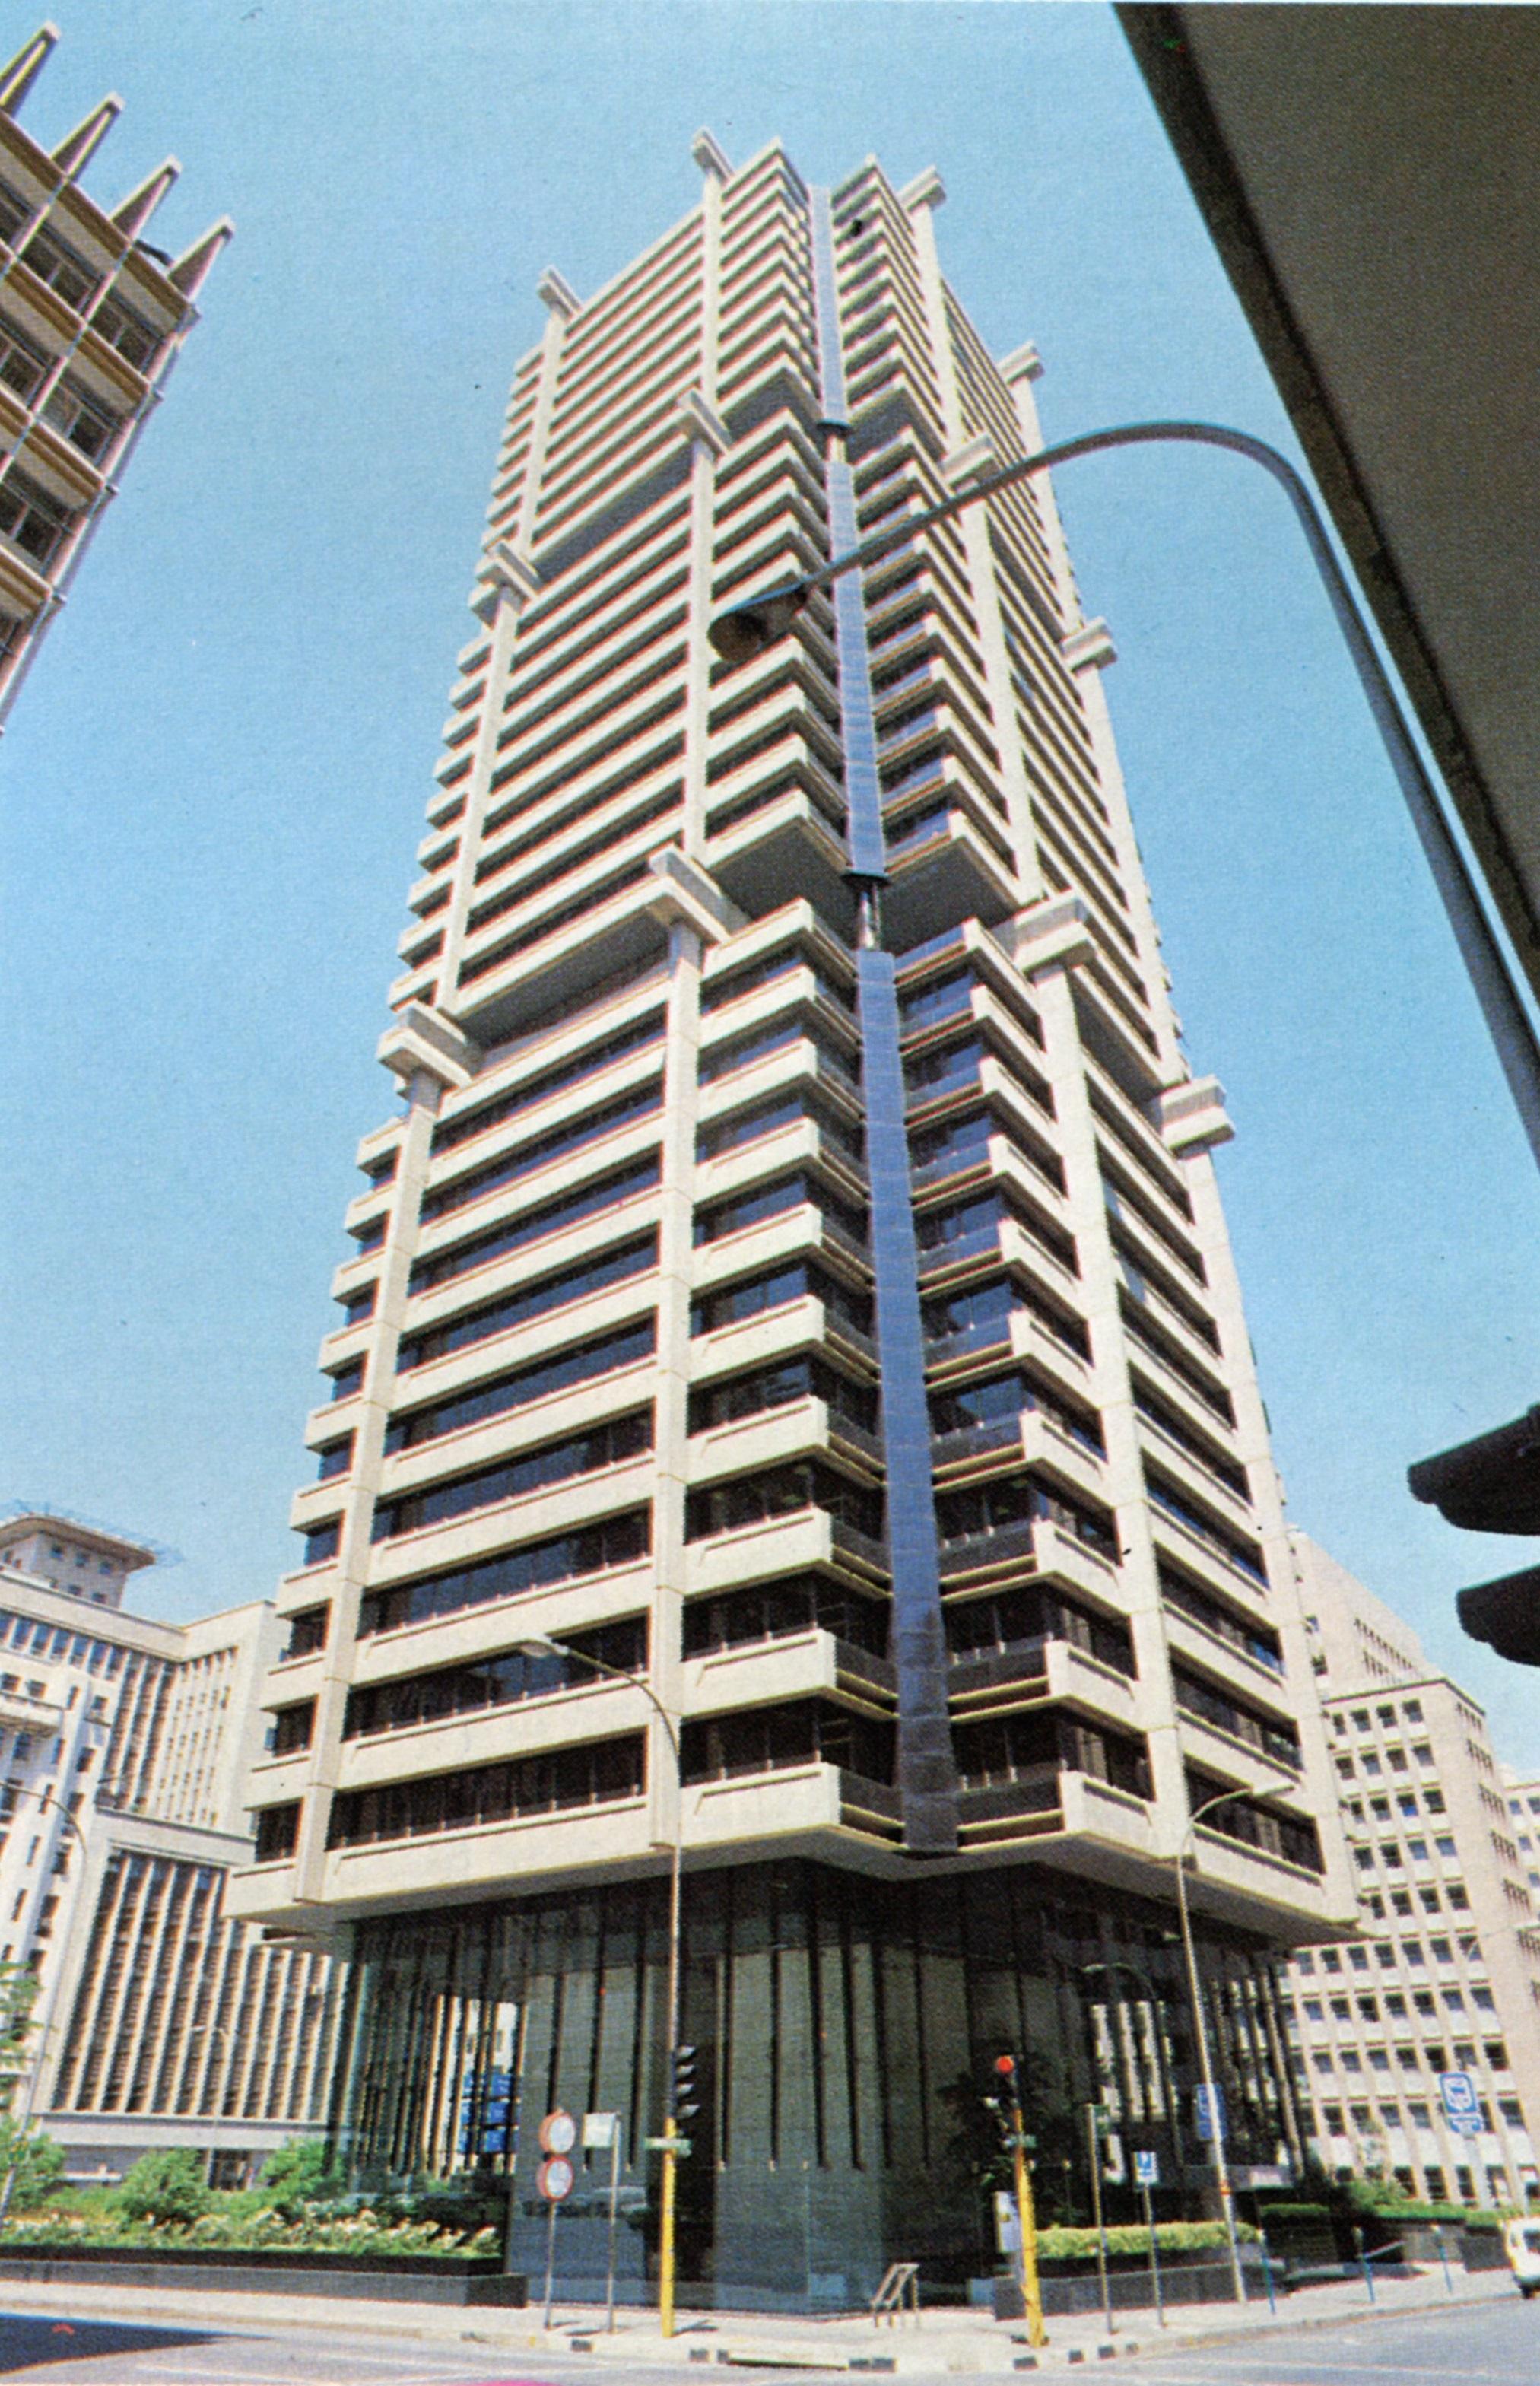 Condo Design Floor Plans File Jhfmars Standard Bank Centre Cnr Fox Hollard Main